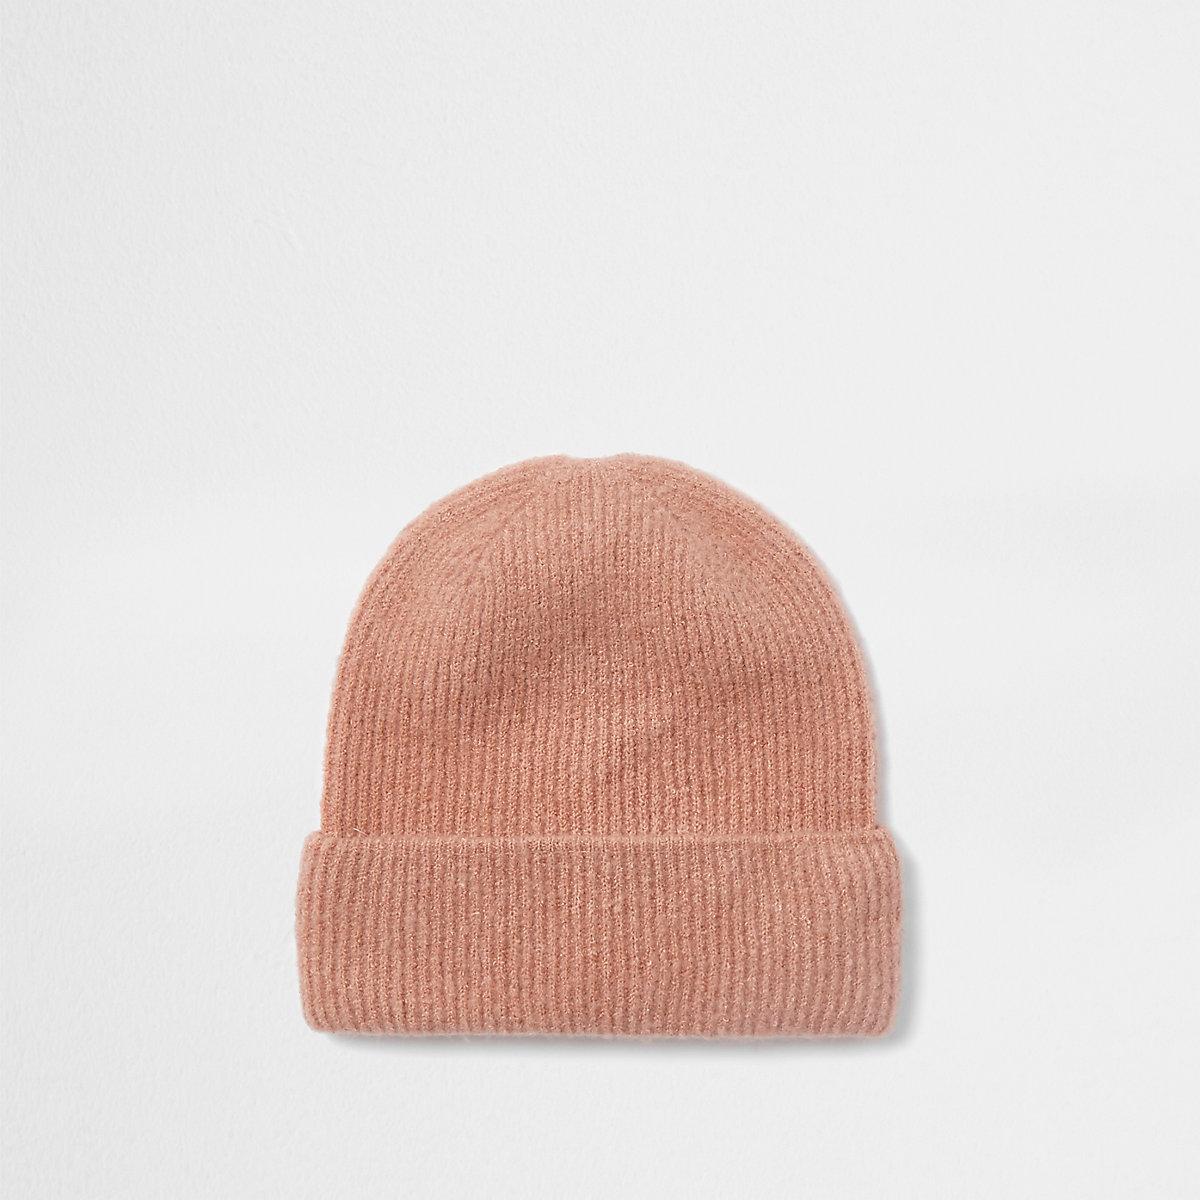 Pink brushed rib knit beanie hat